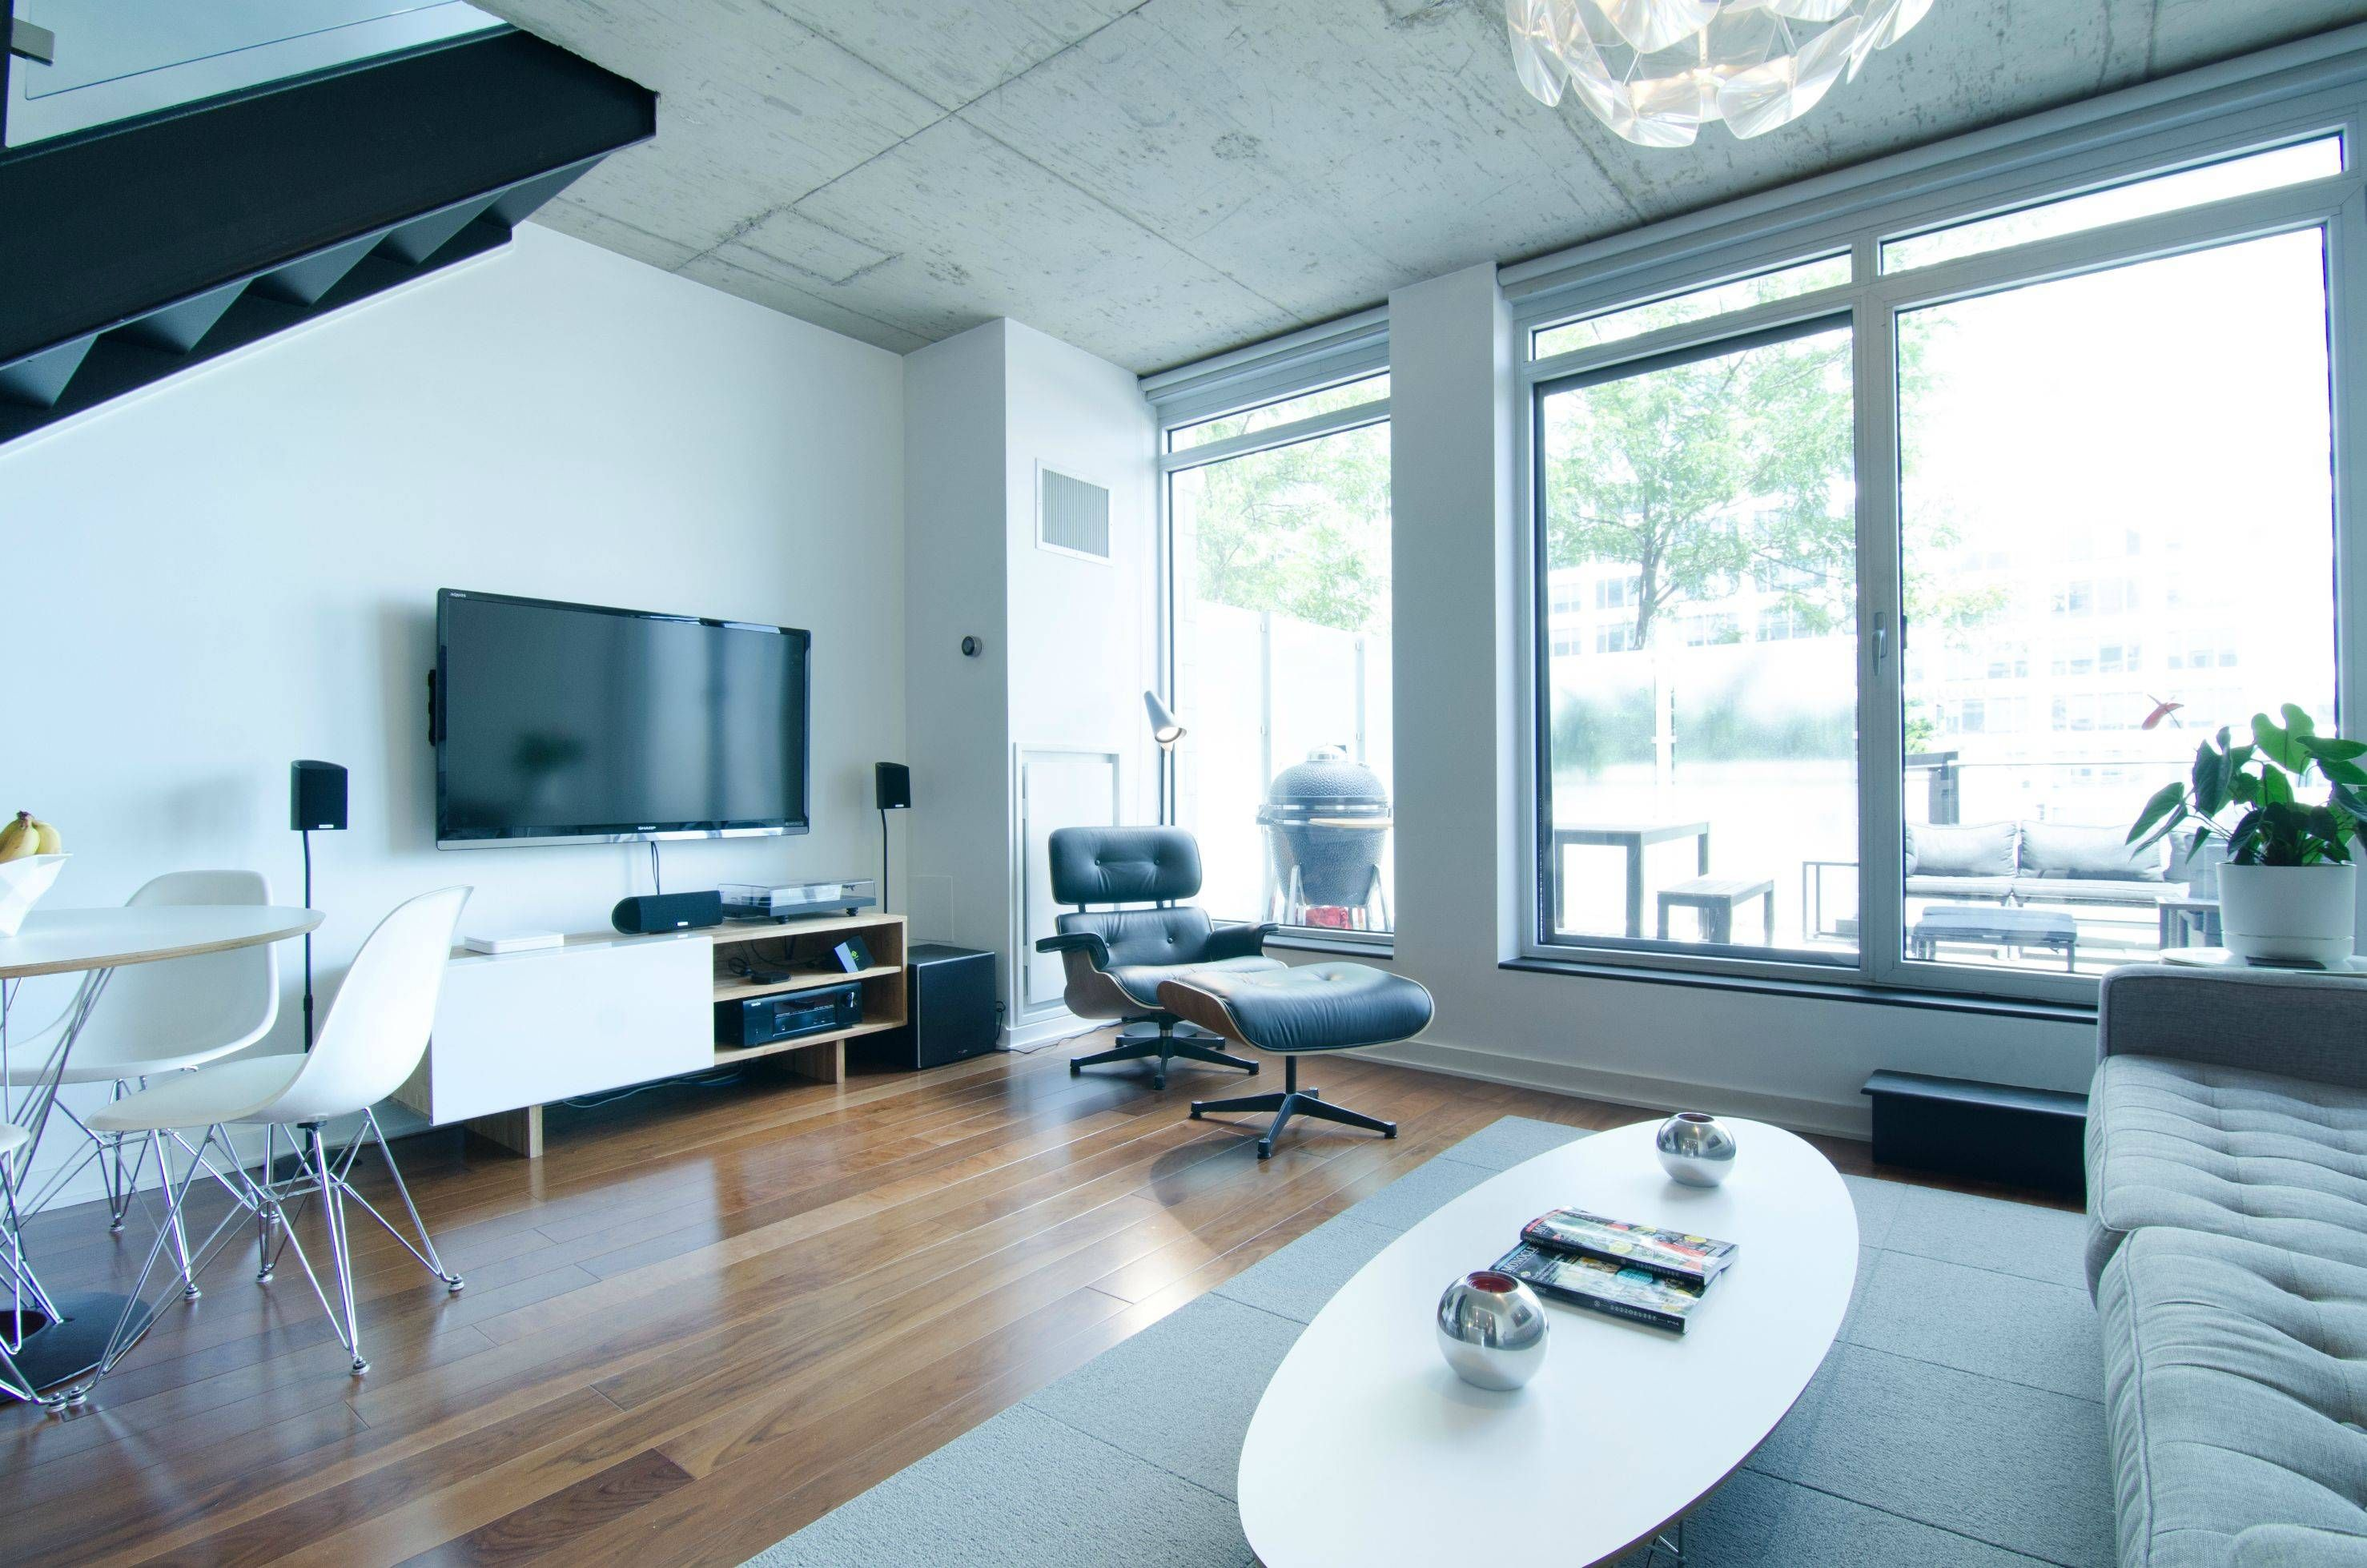 Pin by graham on Furniture Pinterest Interior design Interior